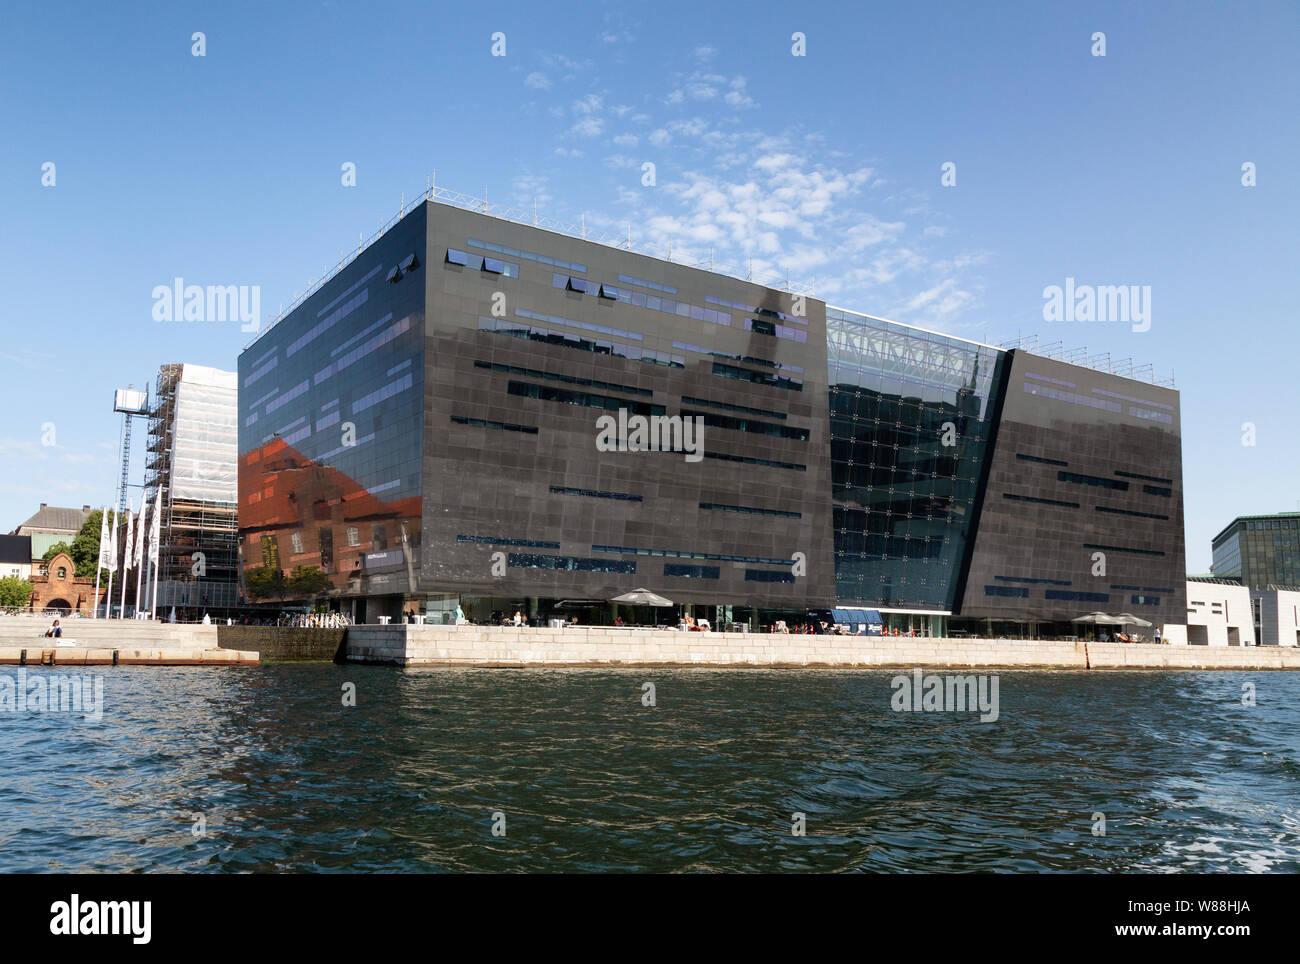 Denmark architecture; The Black Diamond, a modern extension to the Royal Danish Library Copenhagen, completed in 1999; Copenhagen, Denmark Europe Stock Photo